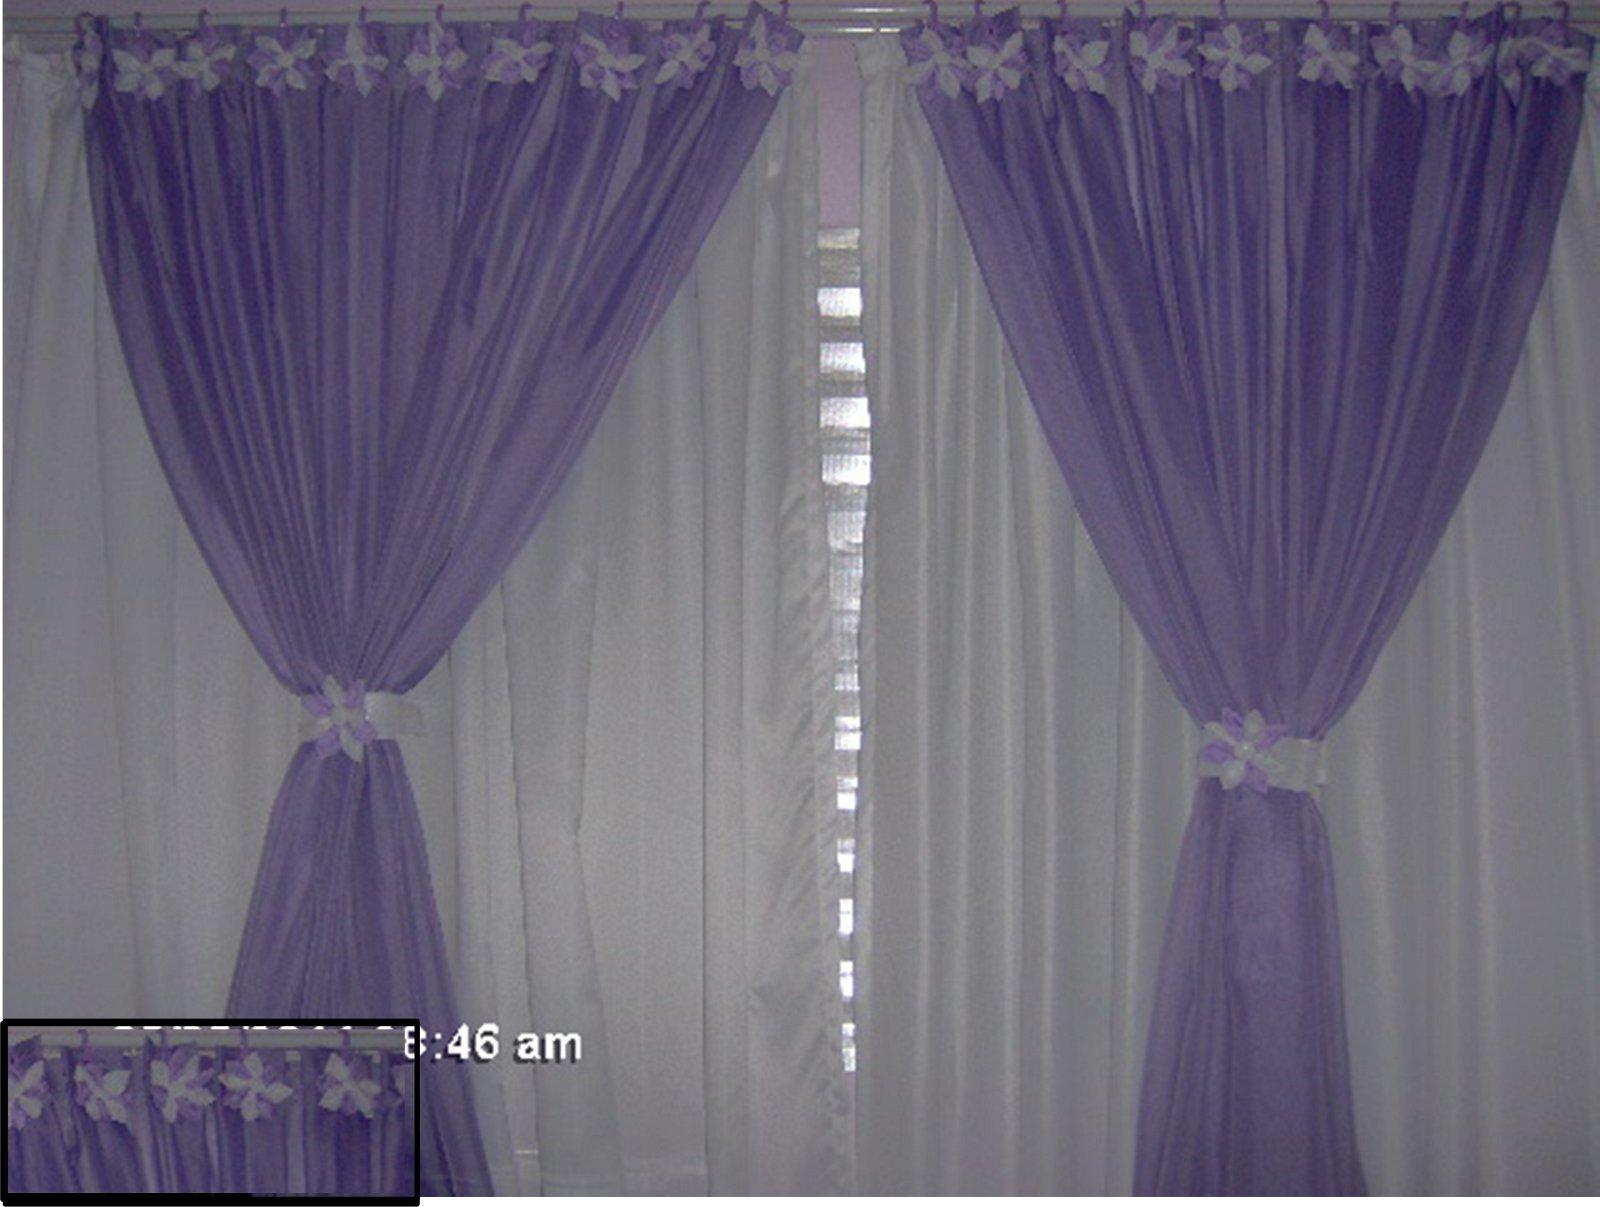 Daniel Sharman lobo adolescente Custom cortina de ducha